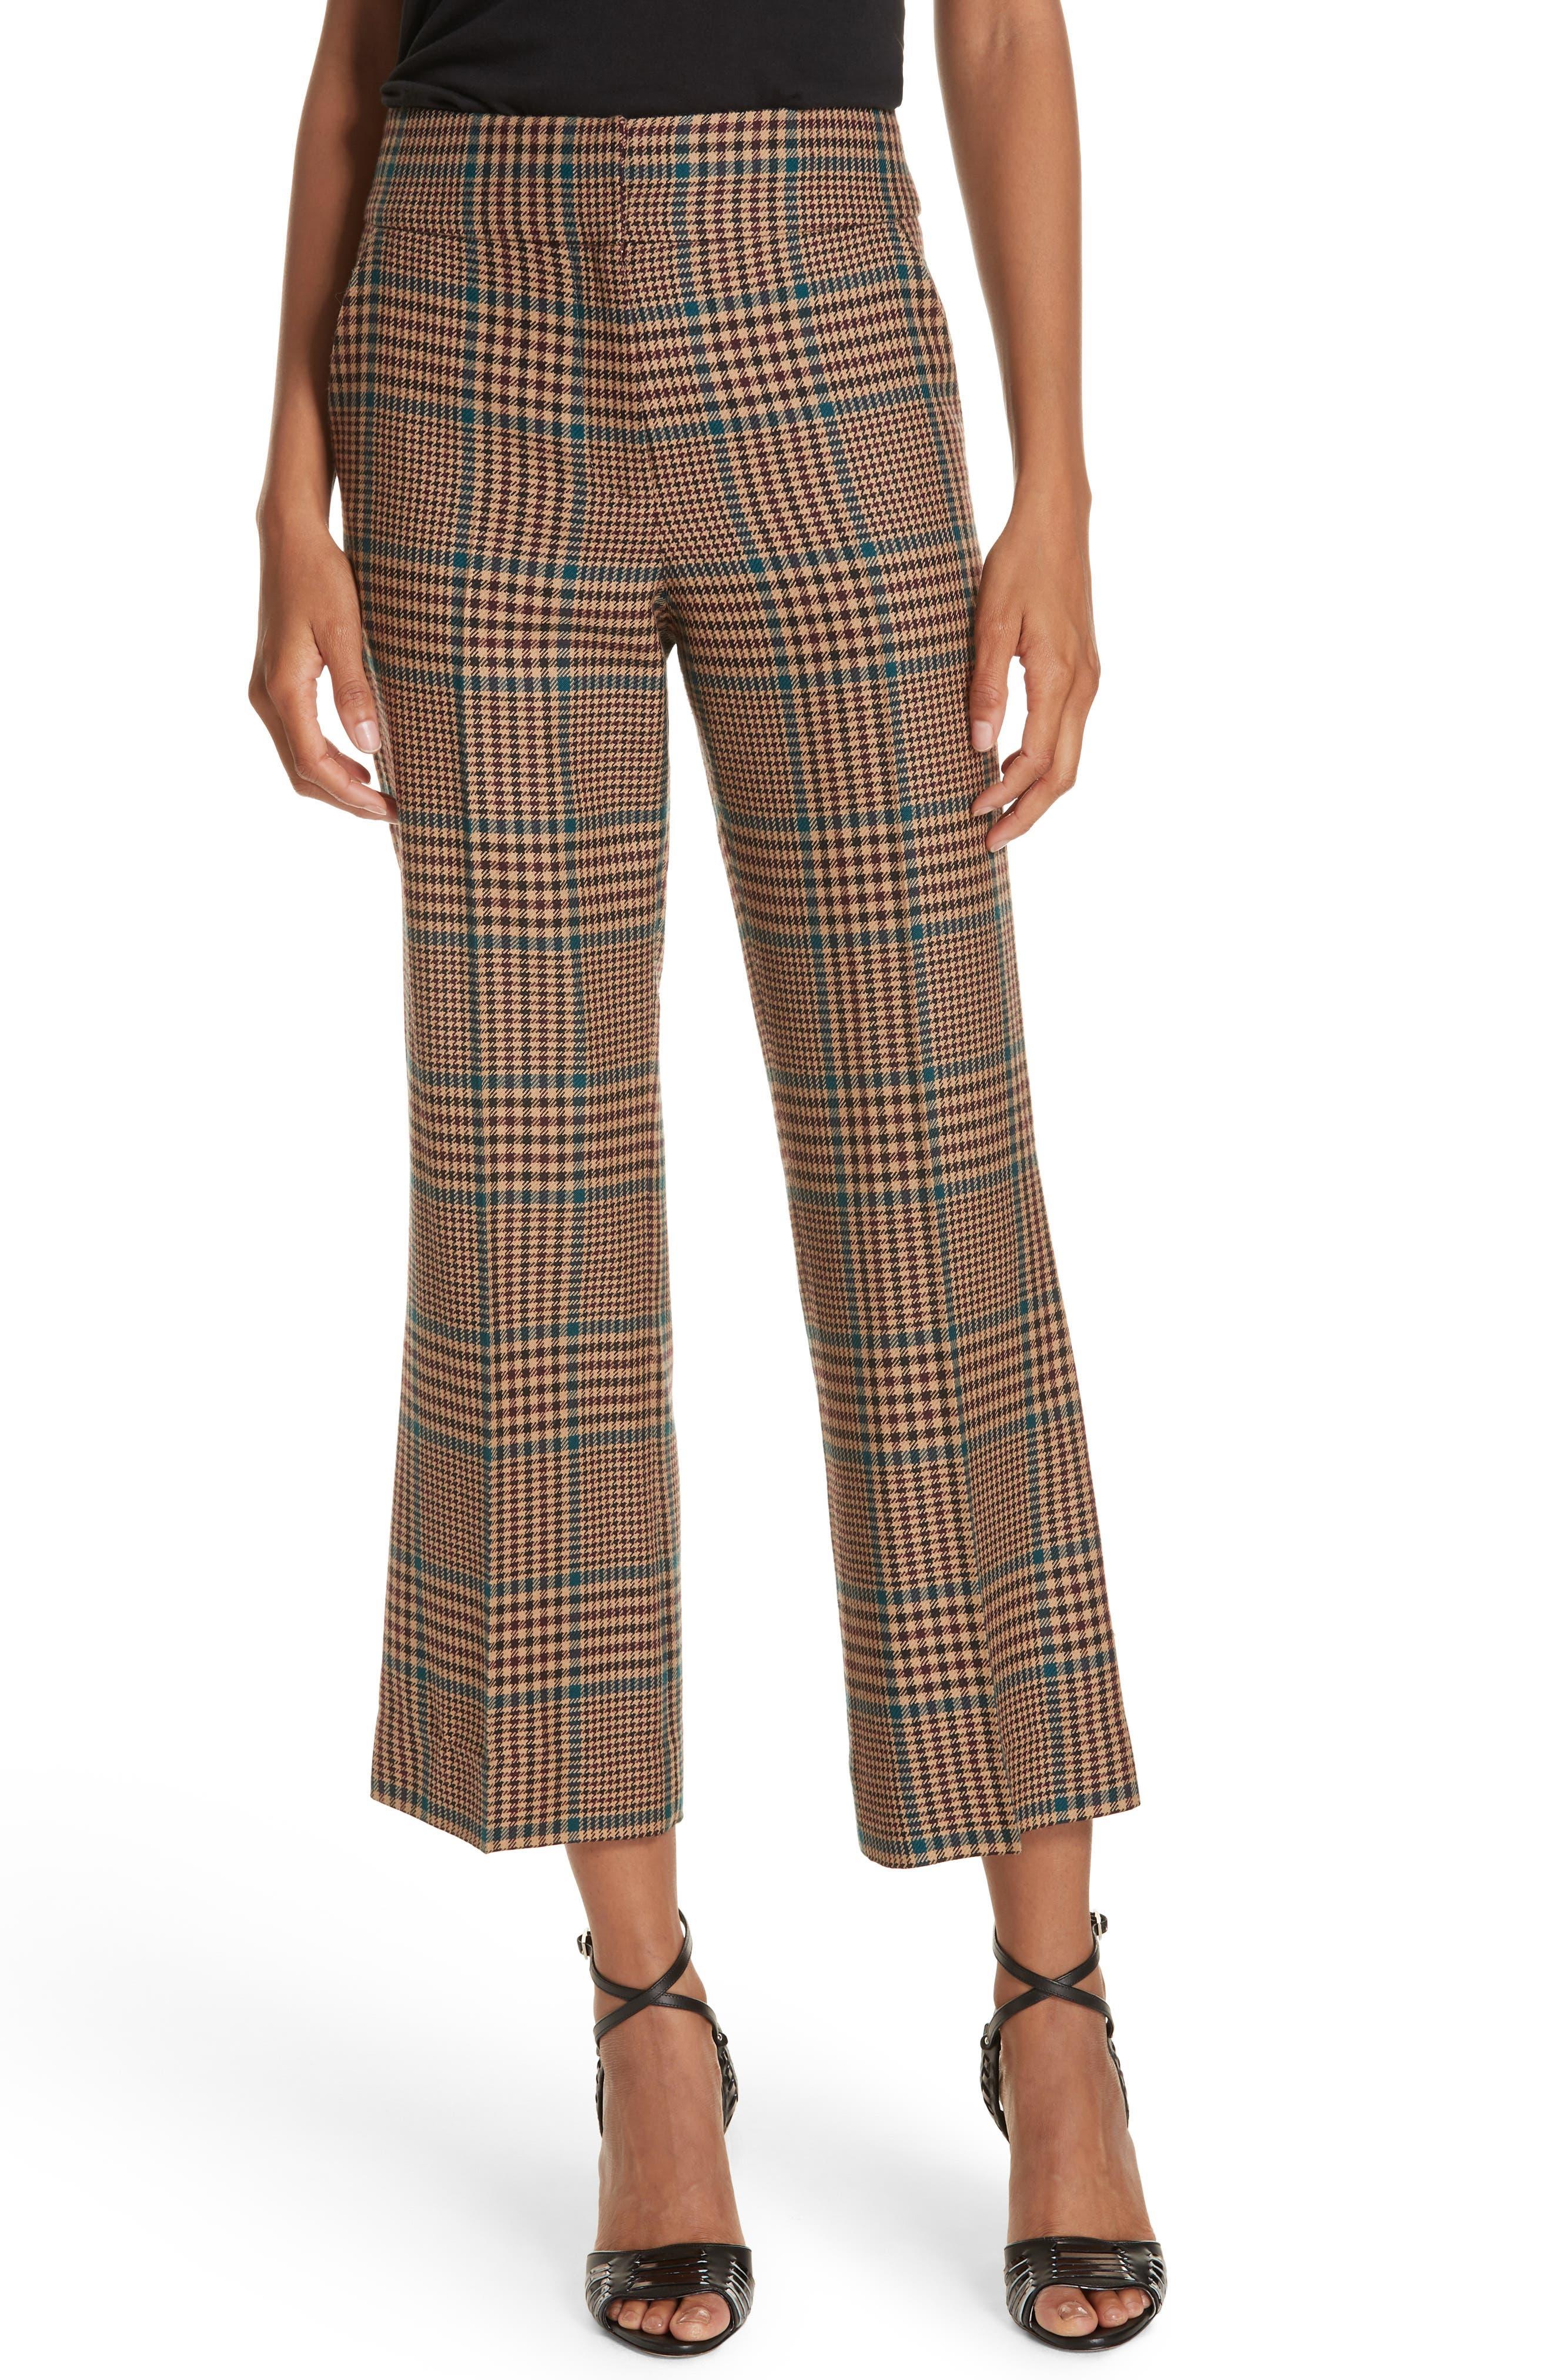 Cormac Plaid Wool Blend Trousers,                             Main thumbnail 1, color,                             230